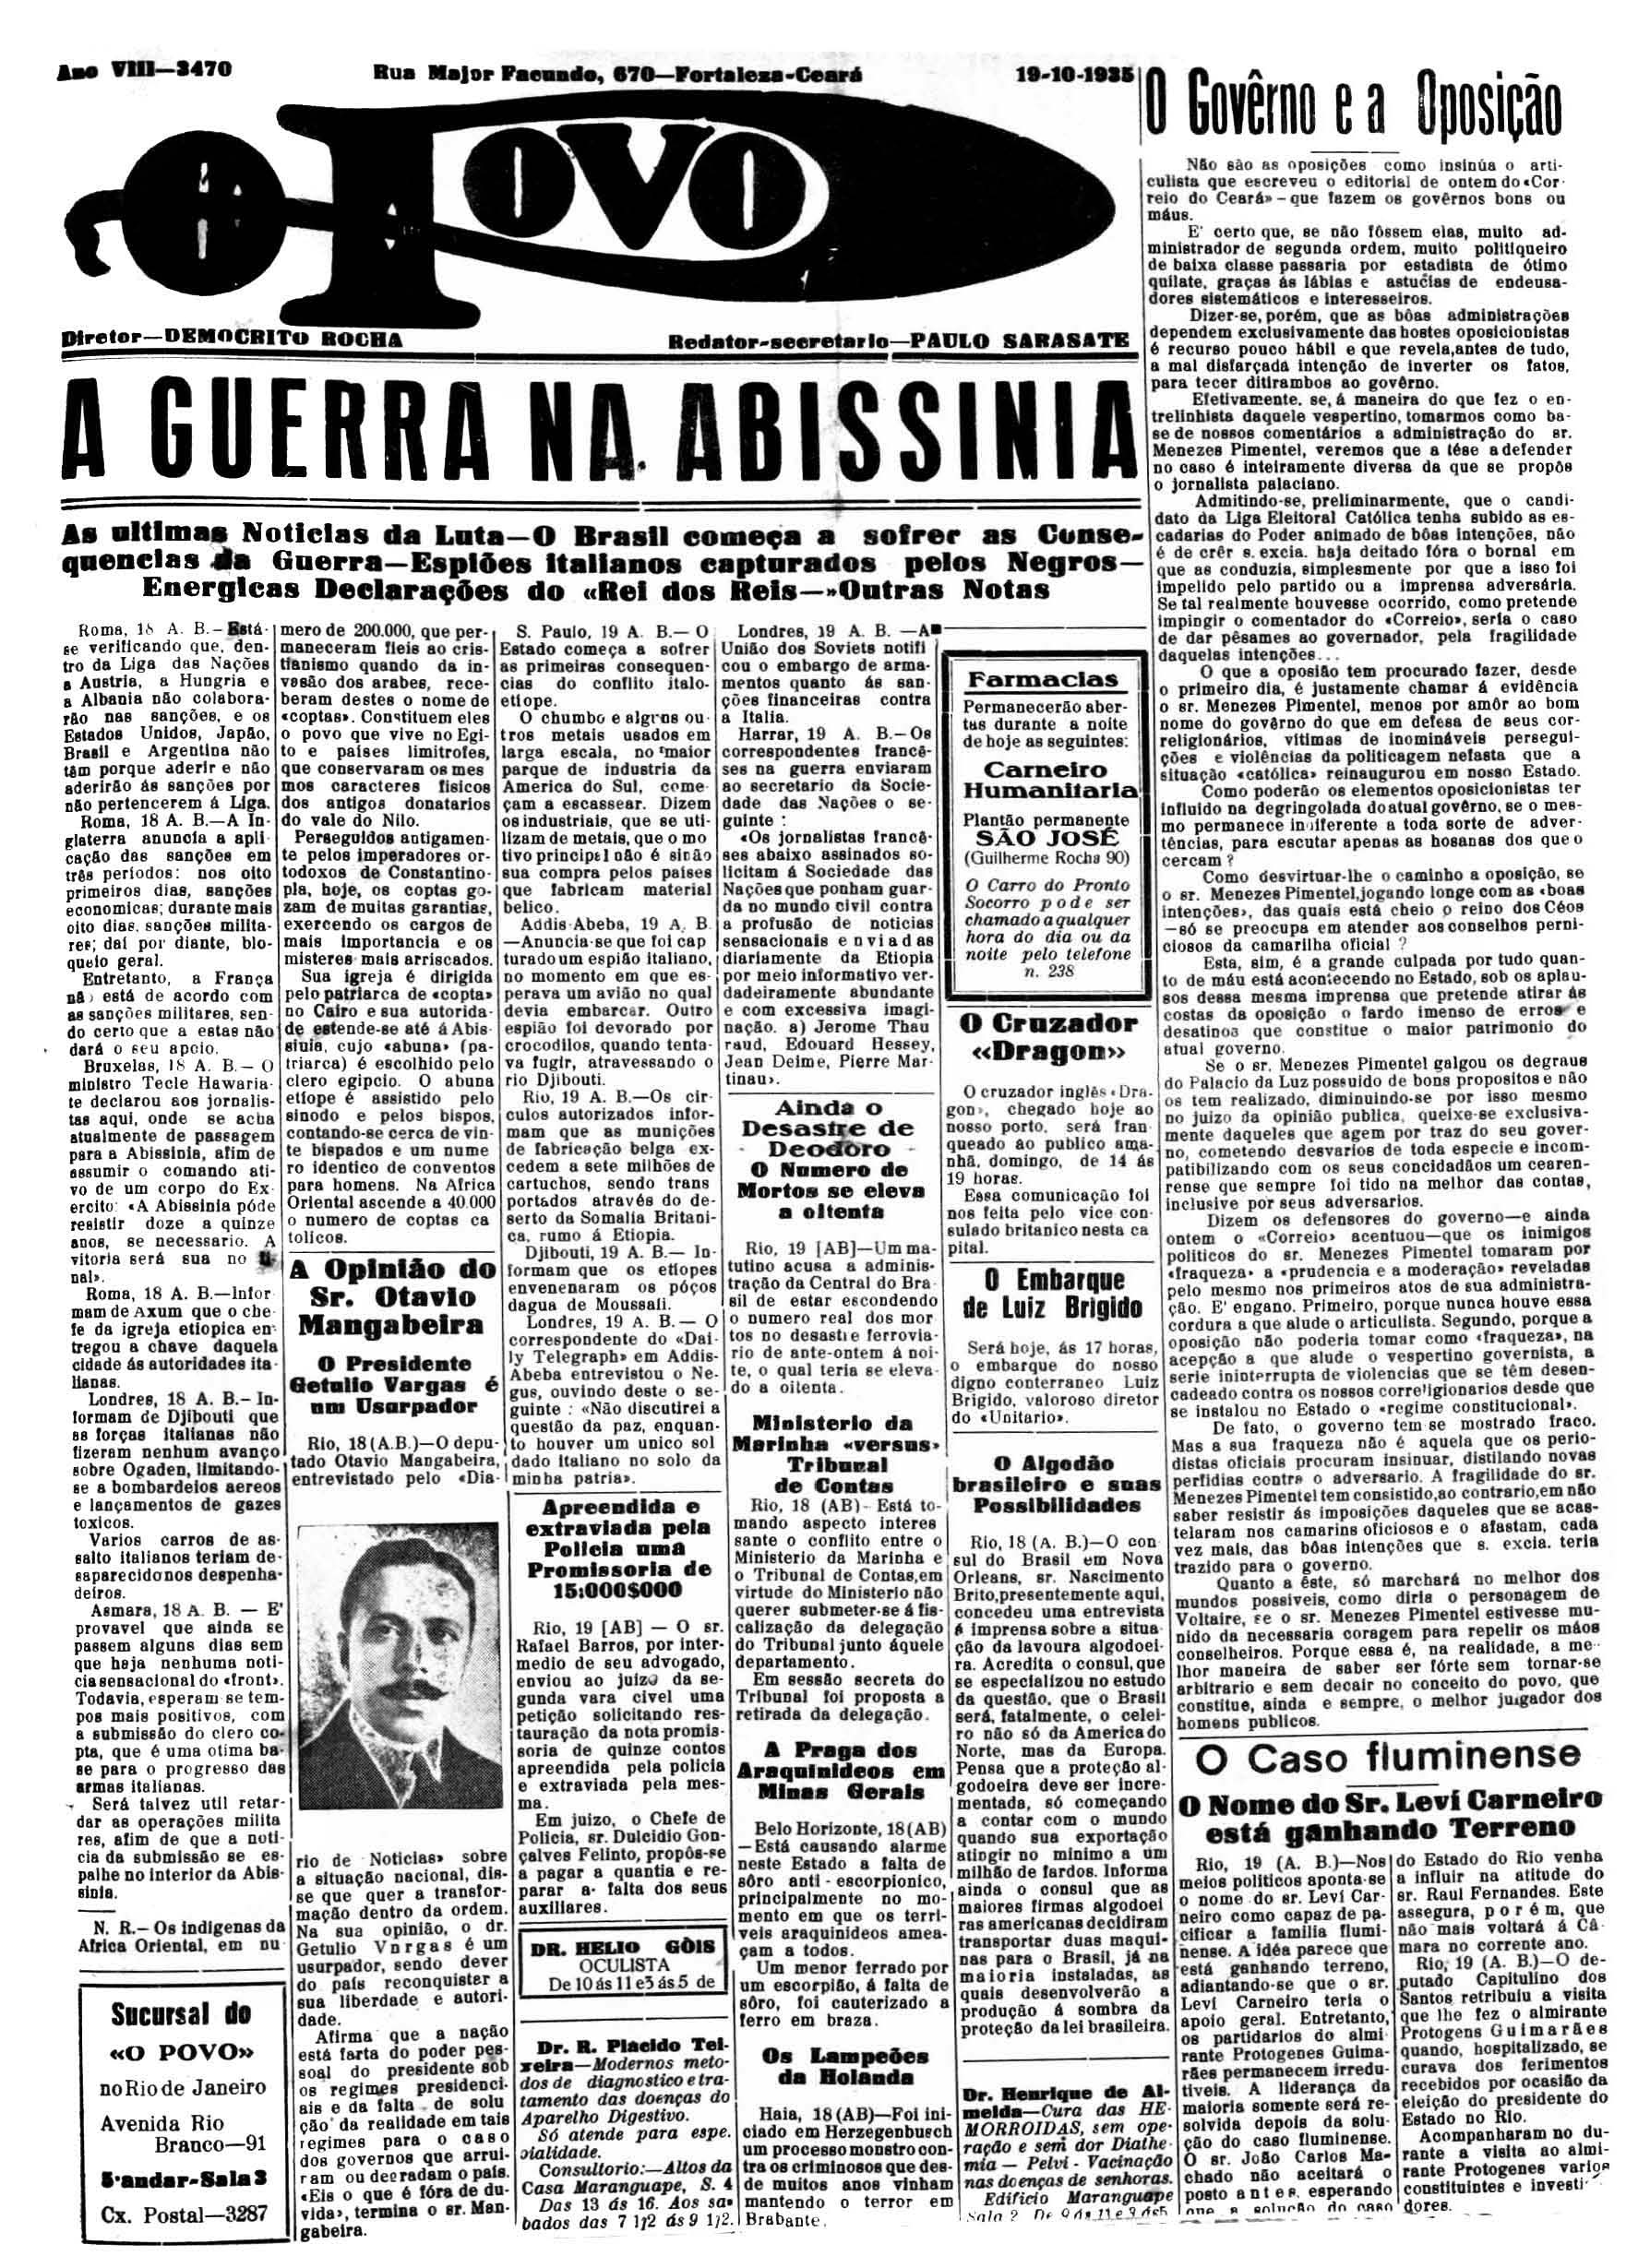 19-10-1935